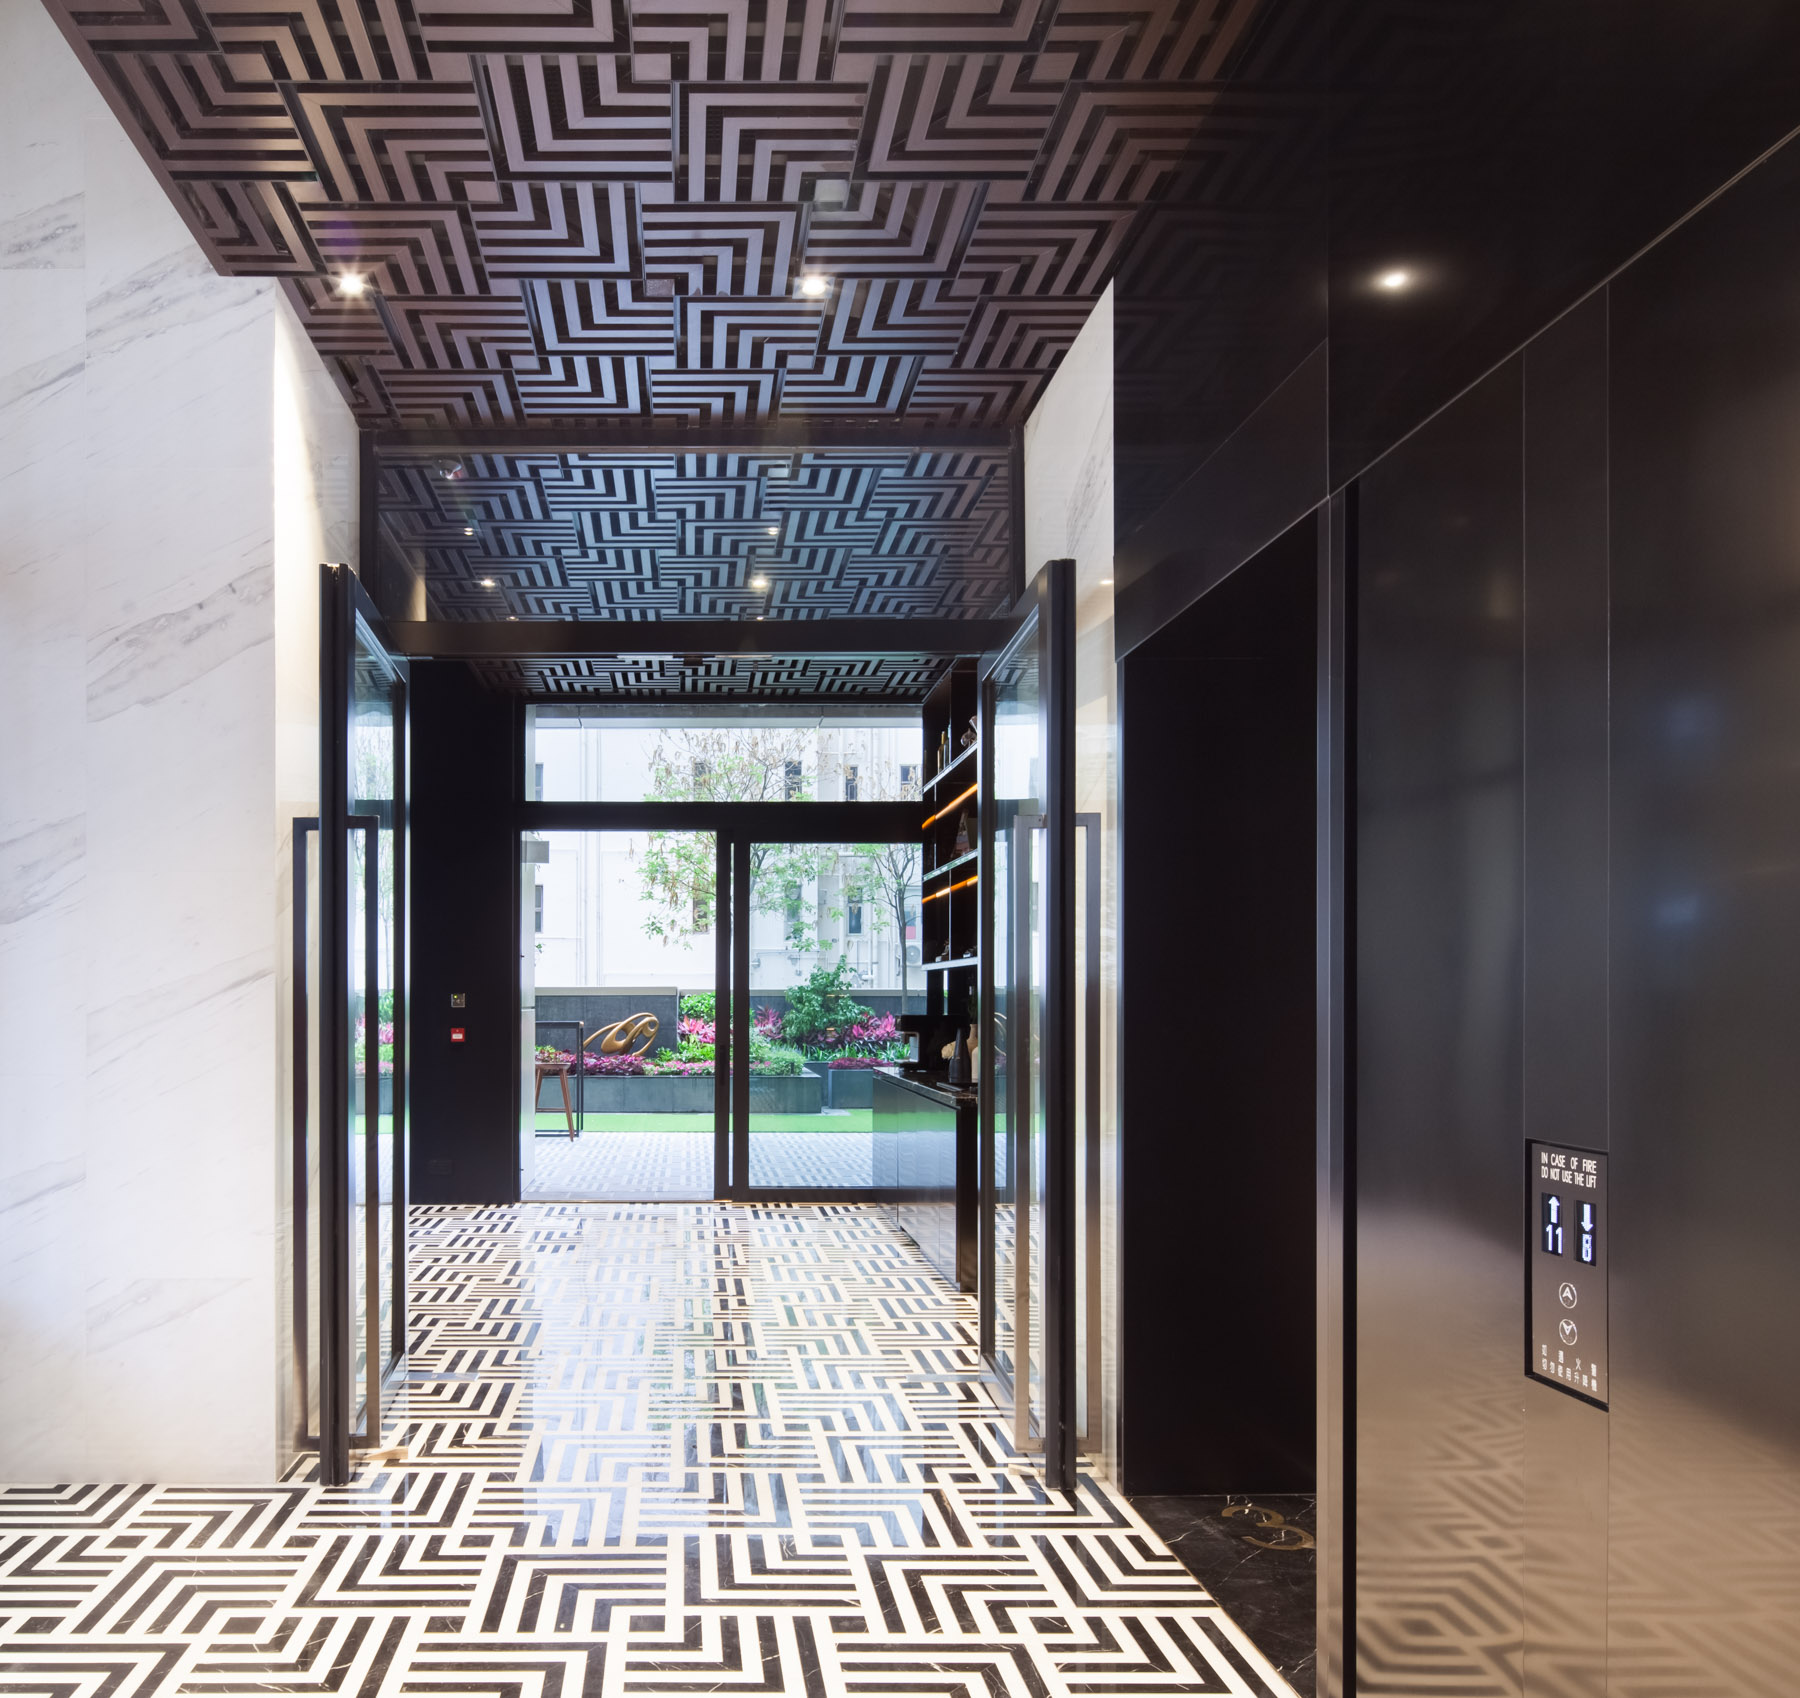 Luna_JM04_Clubhouse-0018_Anahita Chouhan Architect Interior designer .jpg